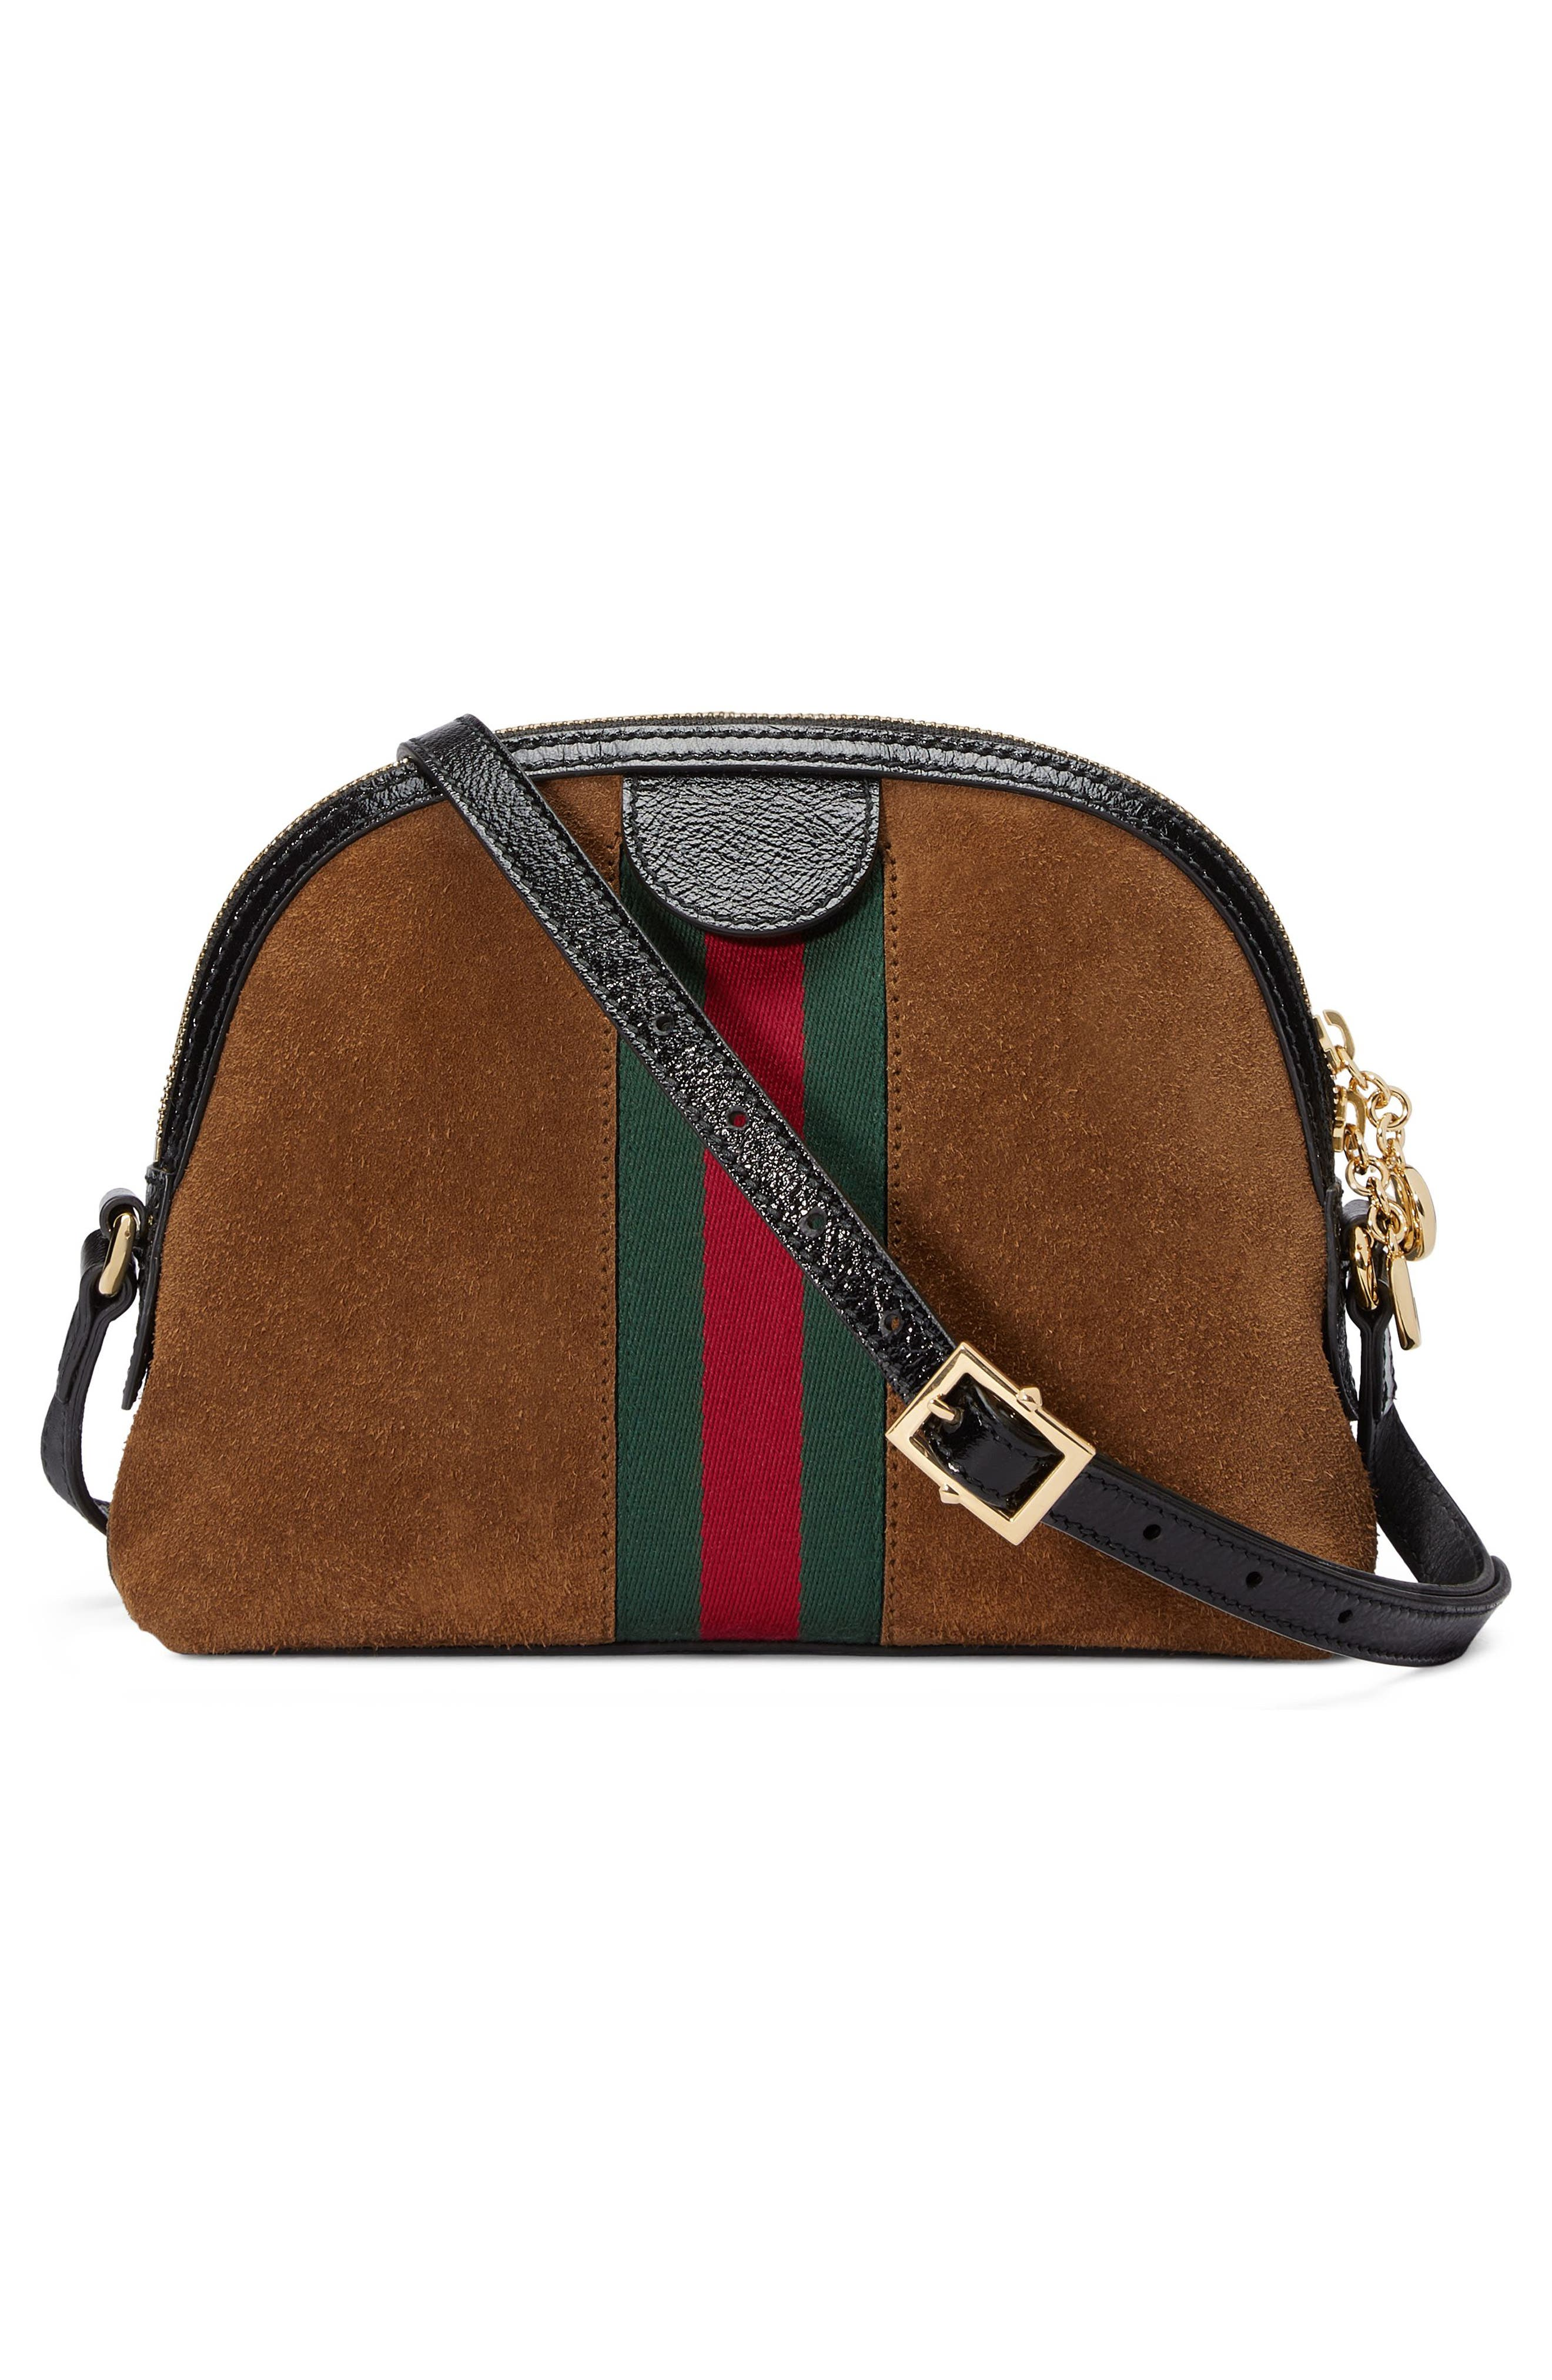 Small Suede Shoulder Bag,                             Alternate thumbnail 2, color,                             Nocciola/ Nero/ Vert Red Vert